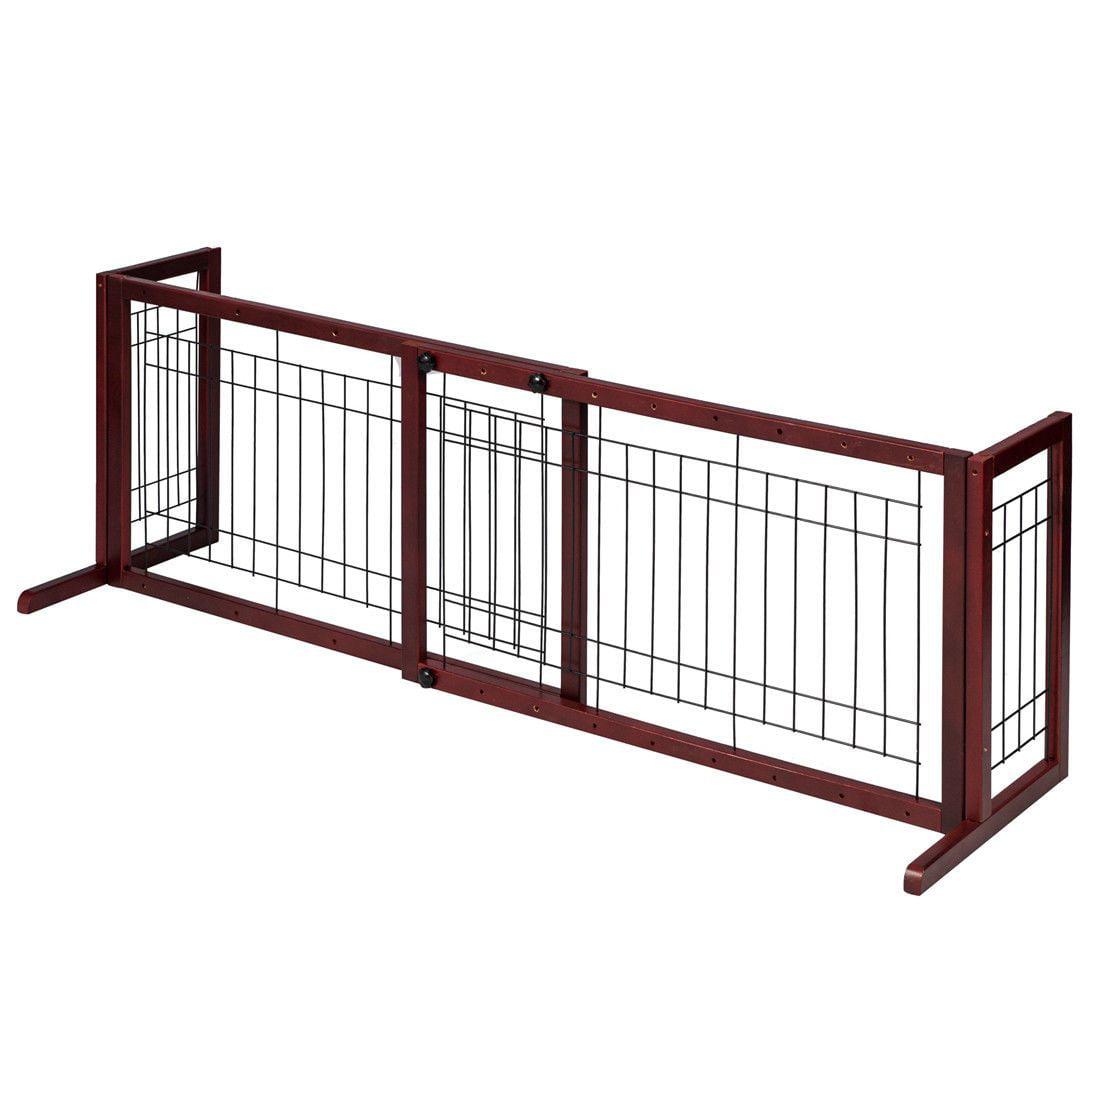 Wooden Fence Freestanding Pet Dog Gate Indoor Adjustable